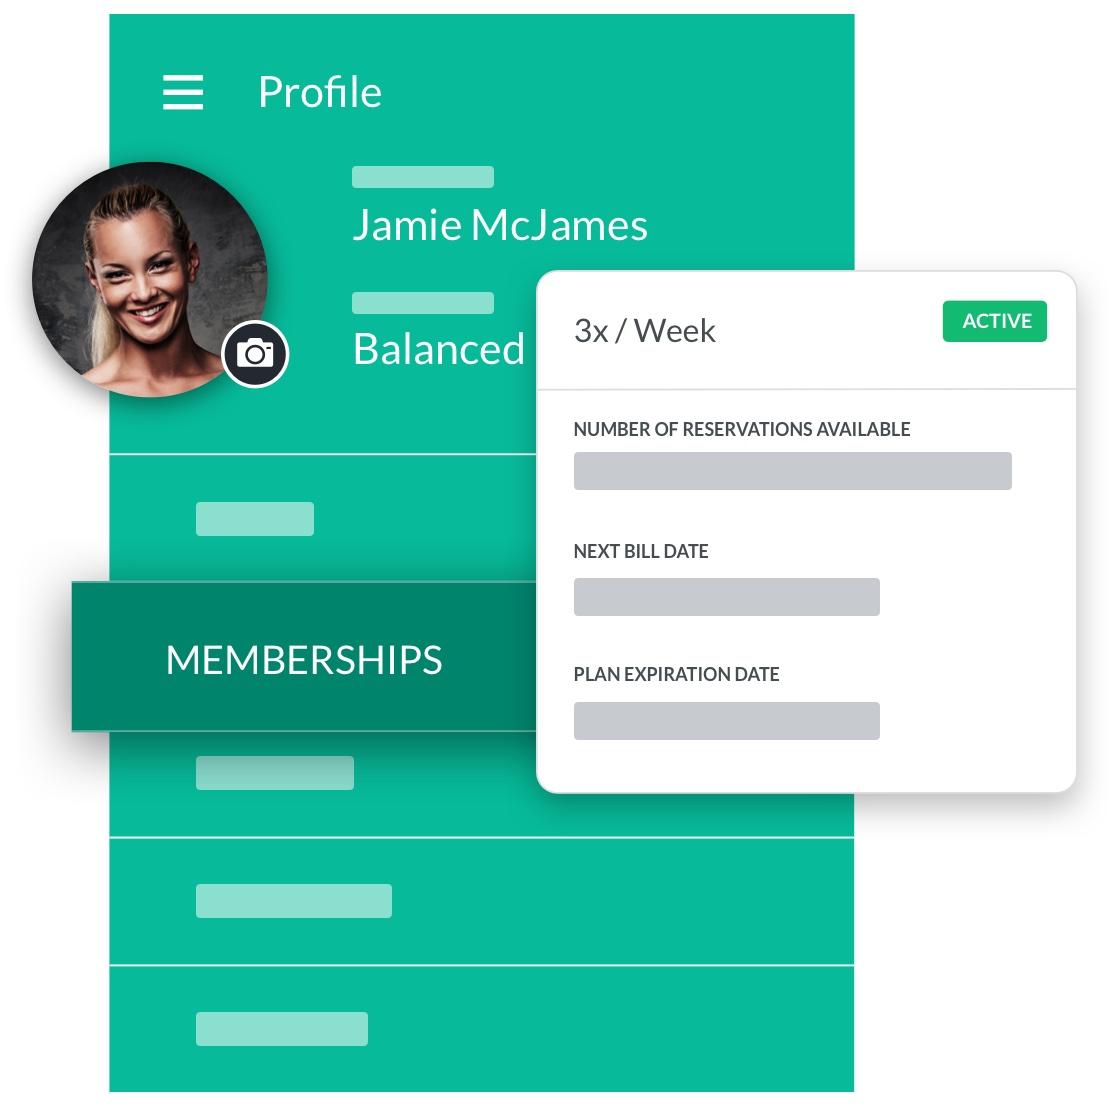 pilates studio software member profile management